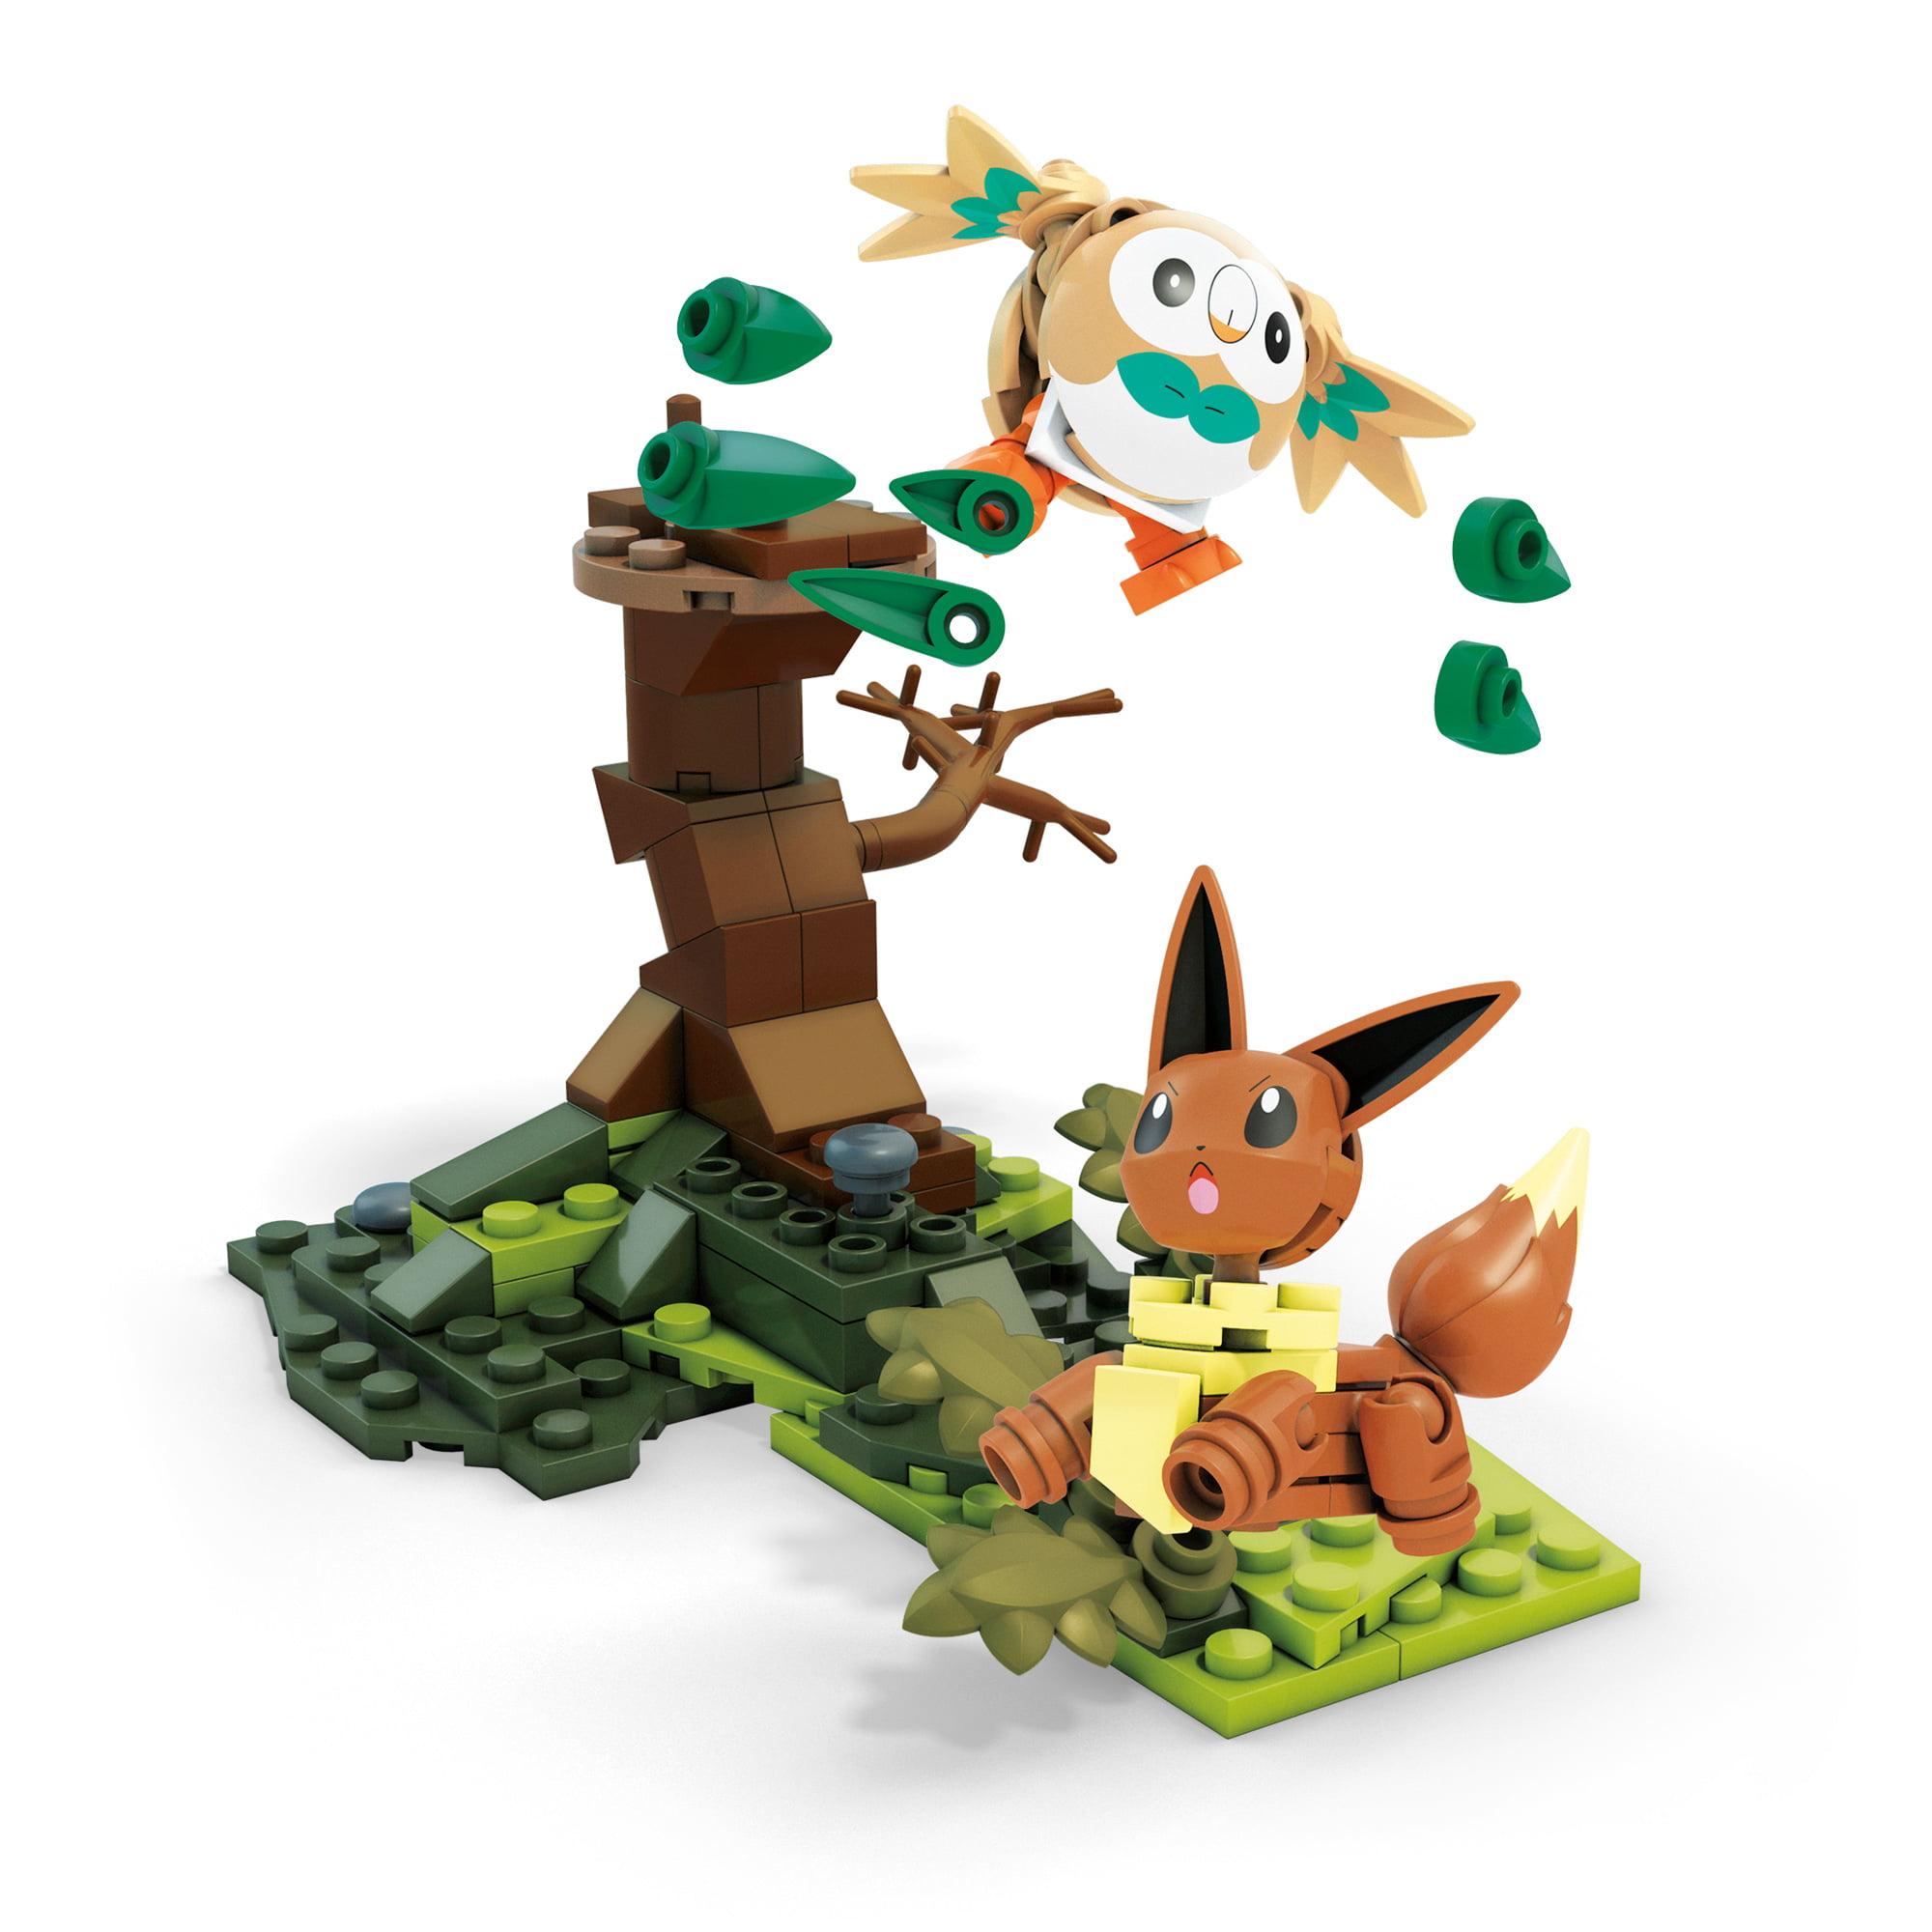 Mega Construx Pokemon Rowlet Vs. Eevee by Mattel